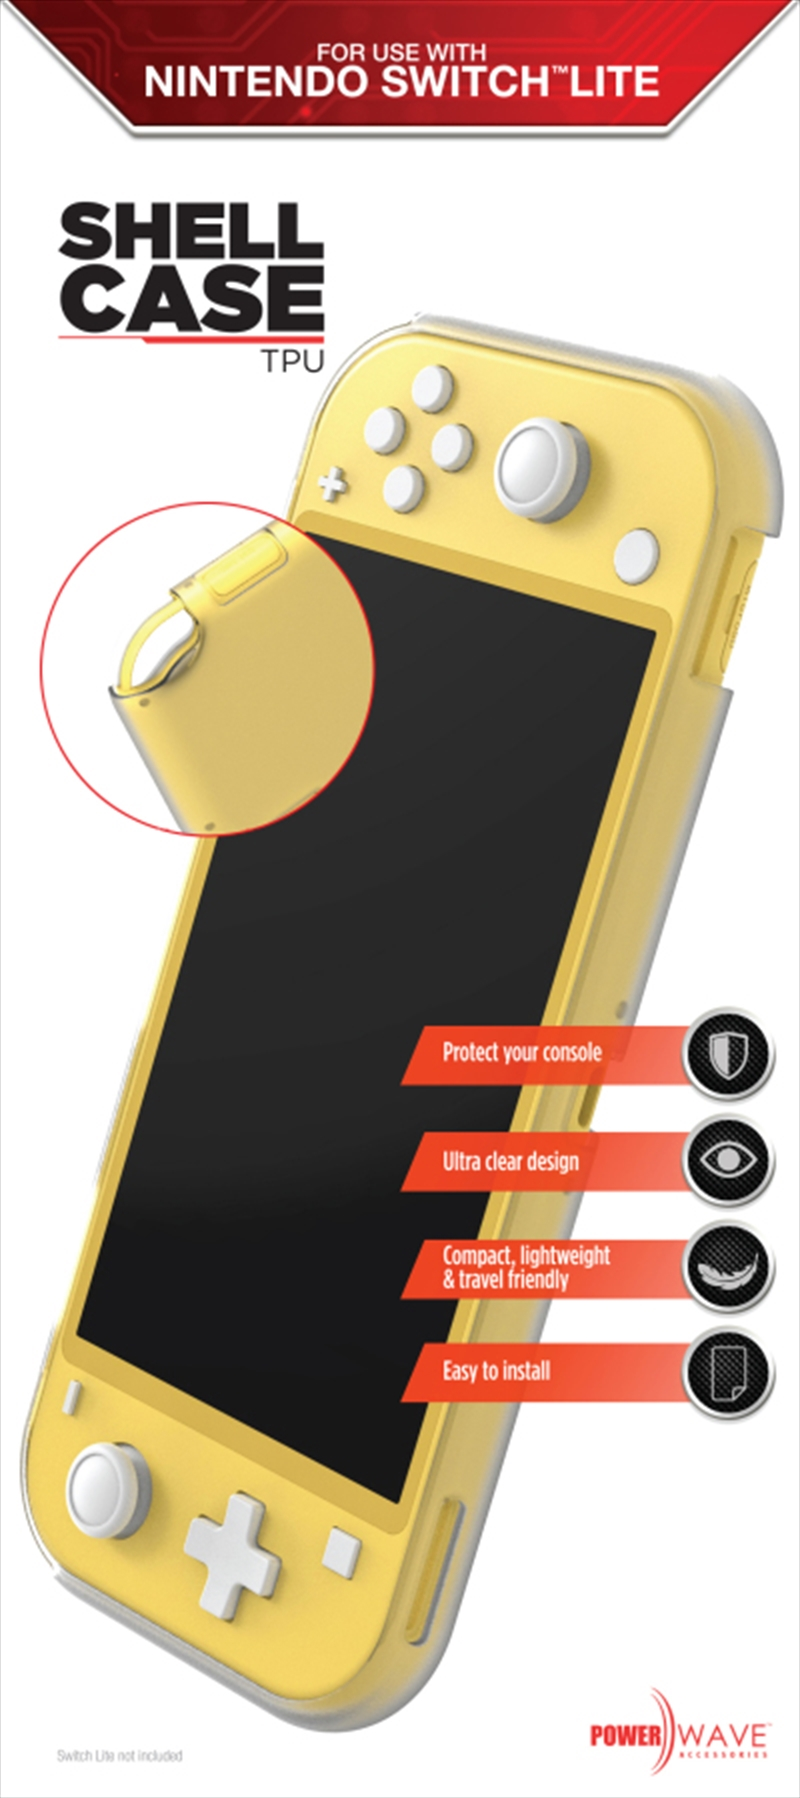 Powerwave Switch Lite TPU Shell Case | Nintendo Switch